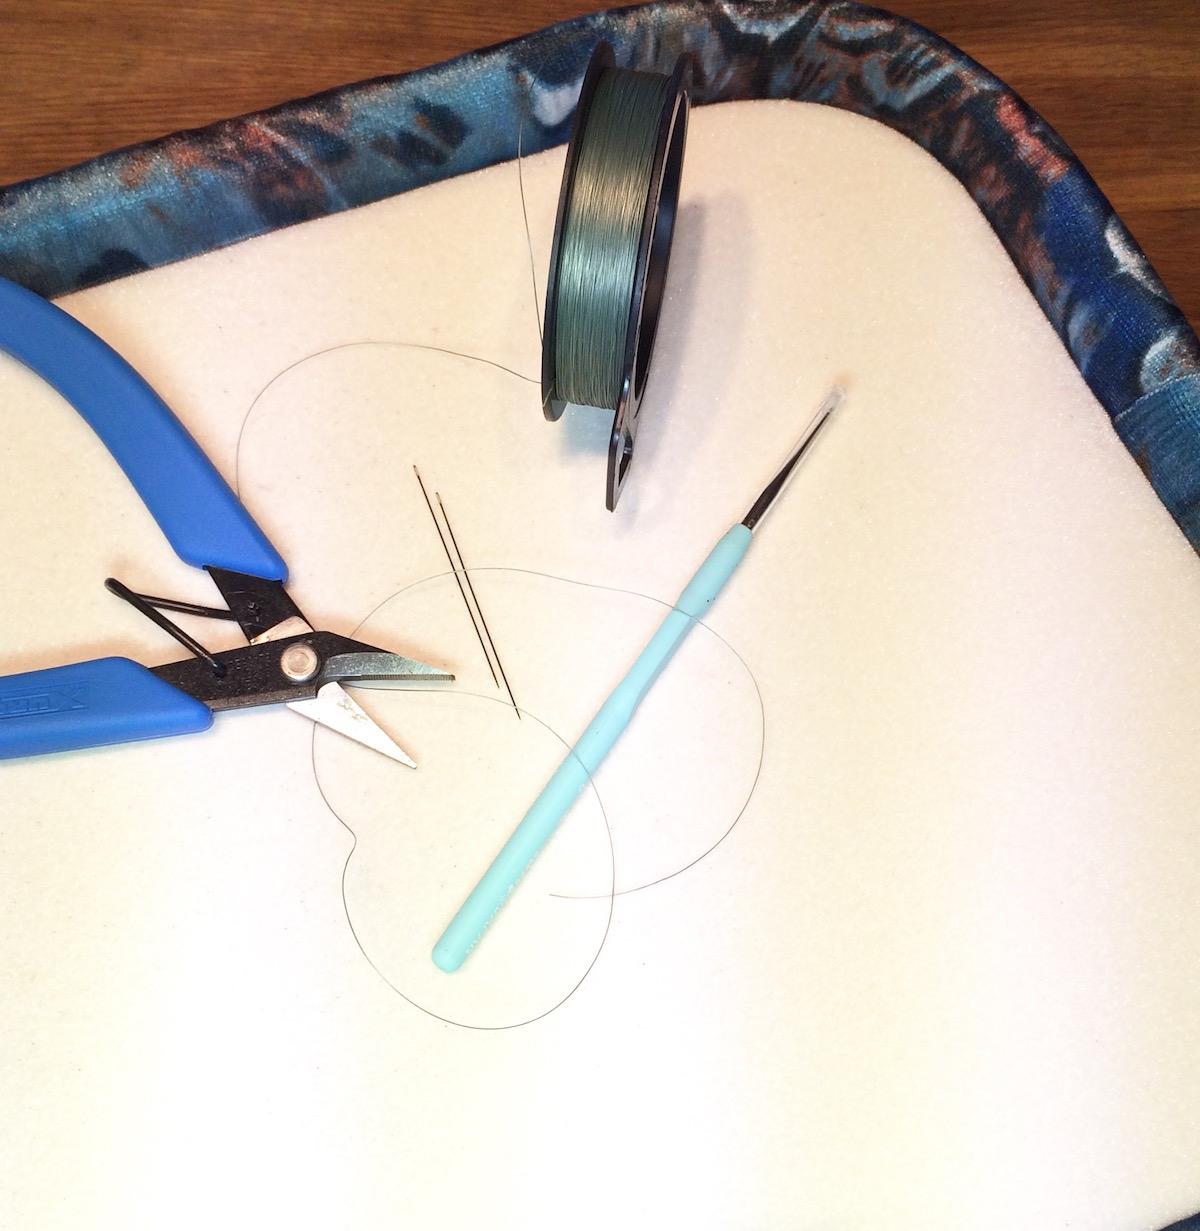 bead board and tools - check!